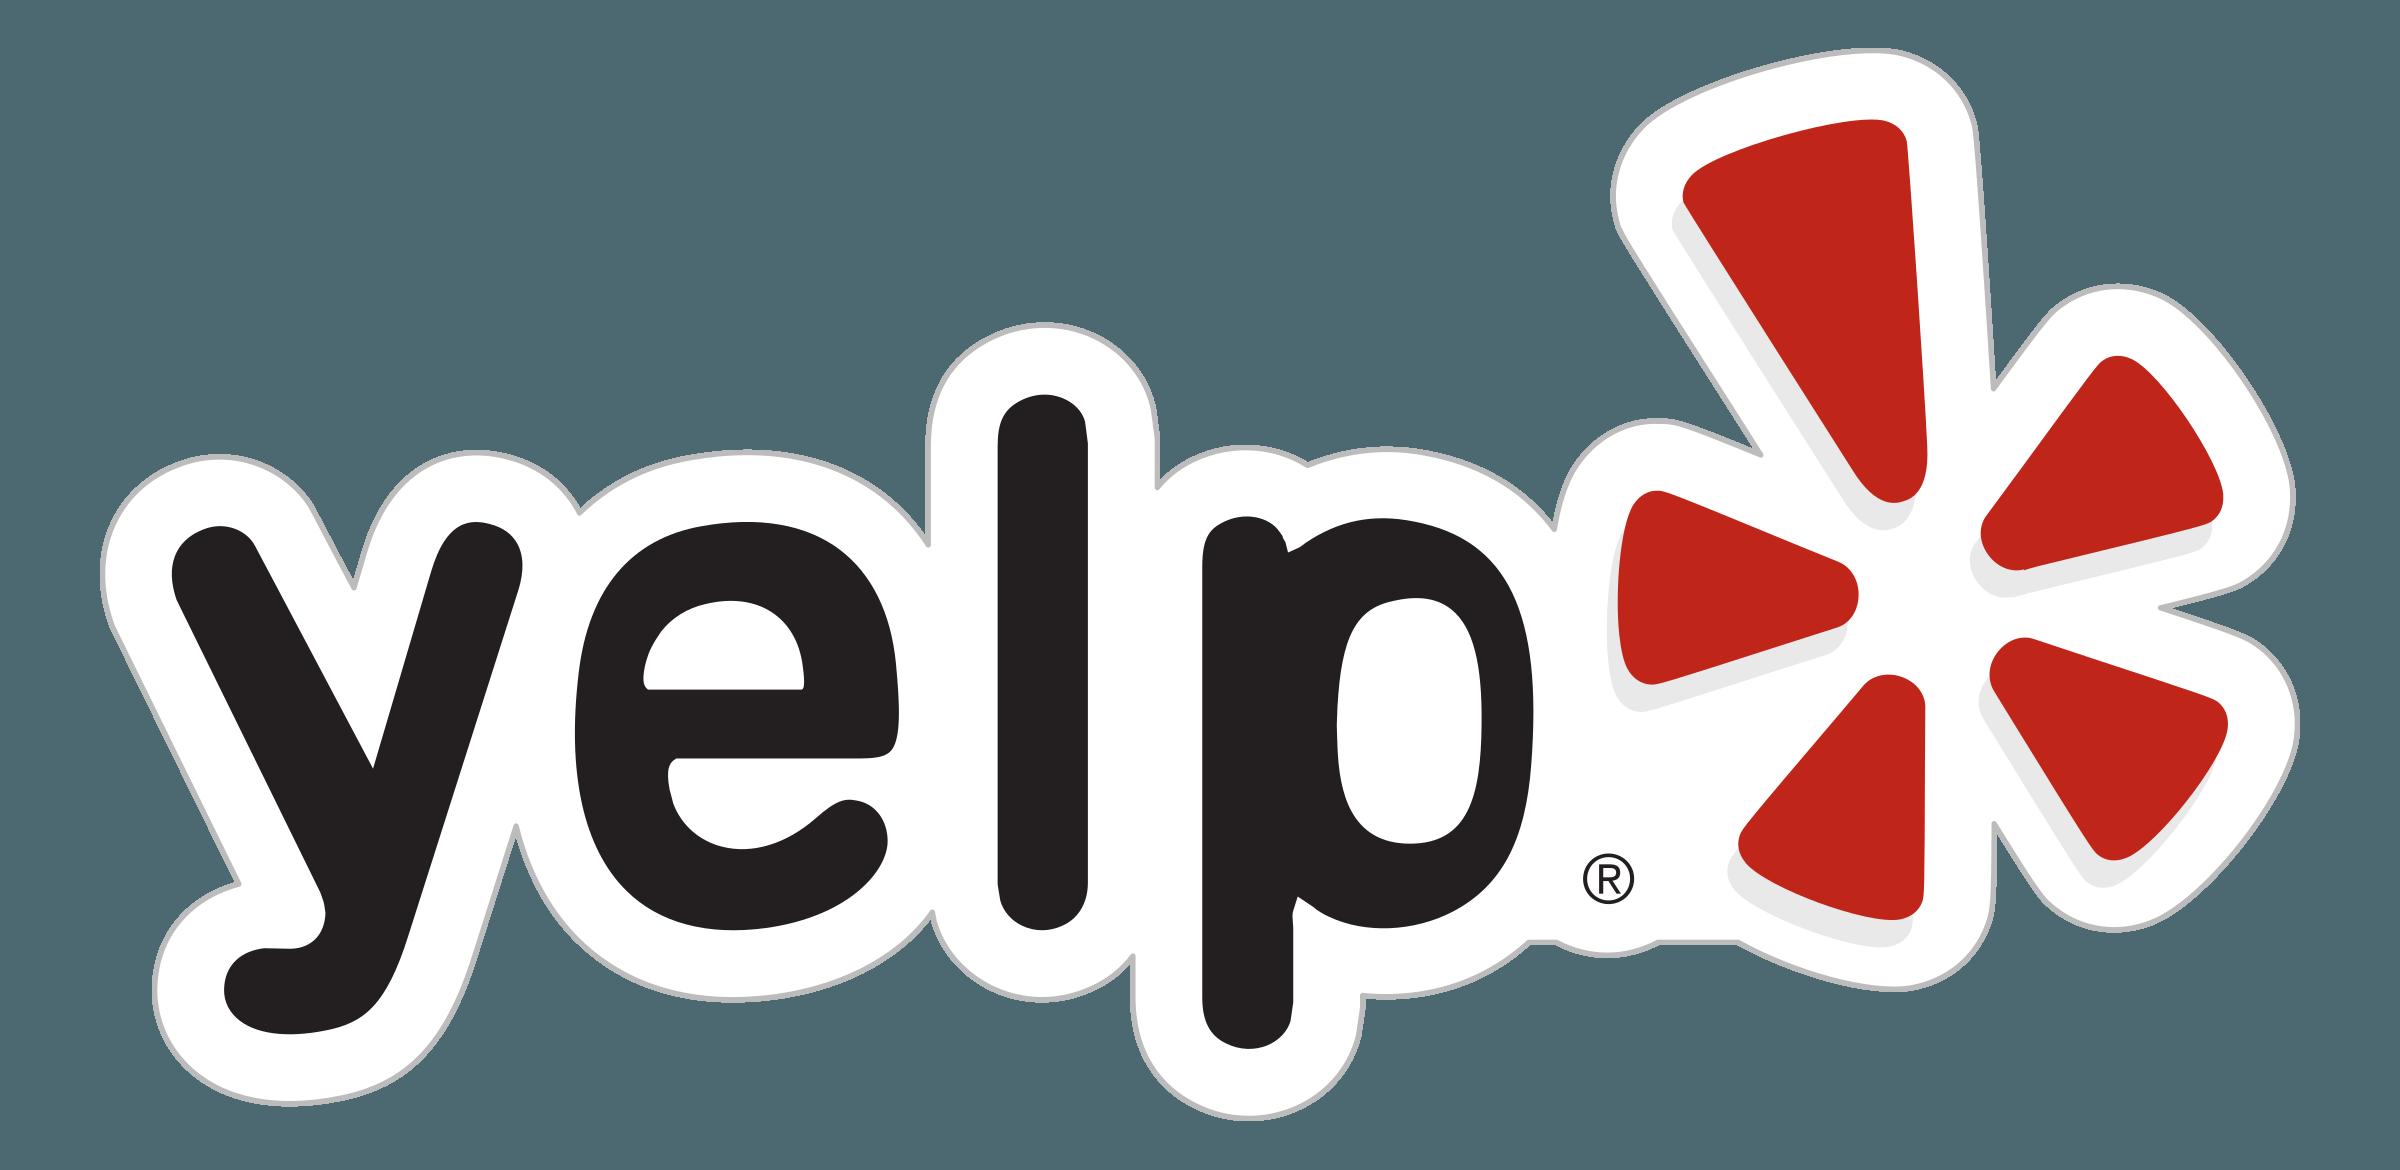 yelp-logo-transparent.png